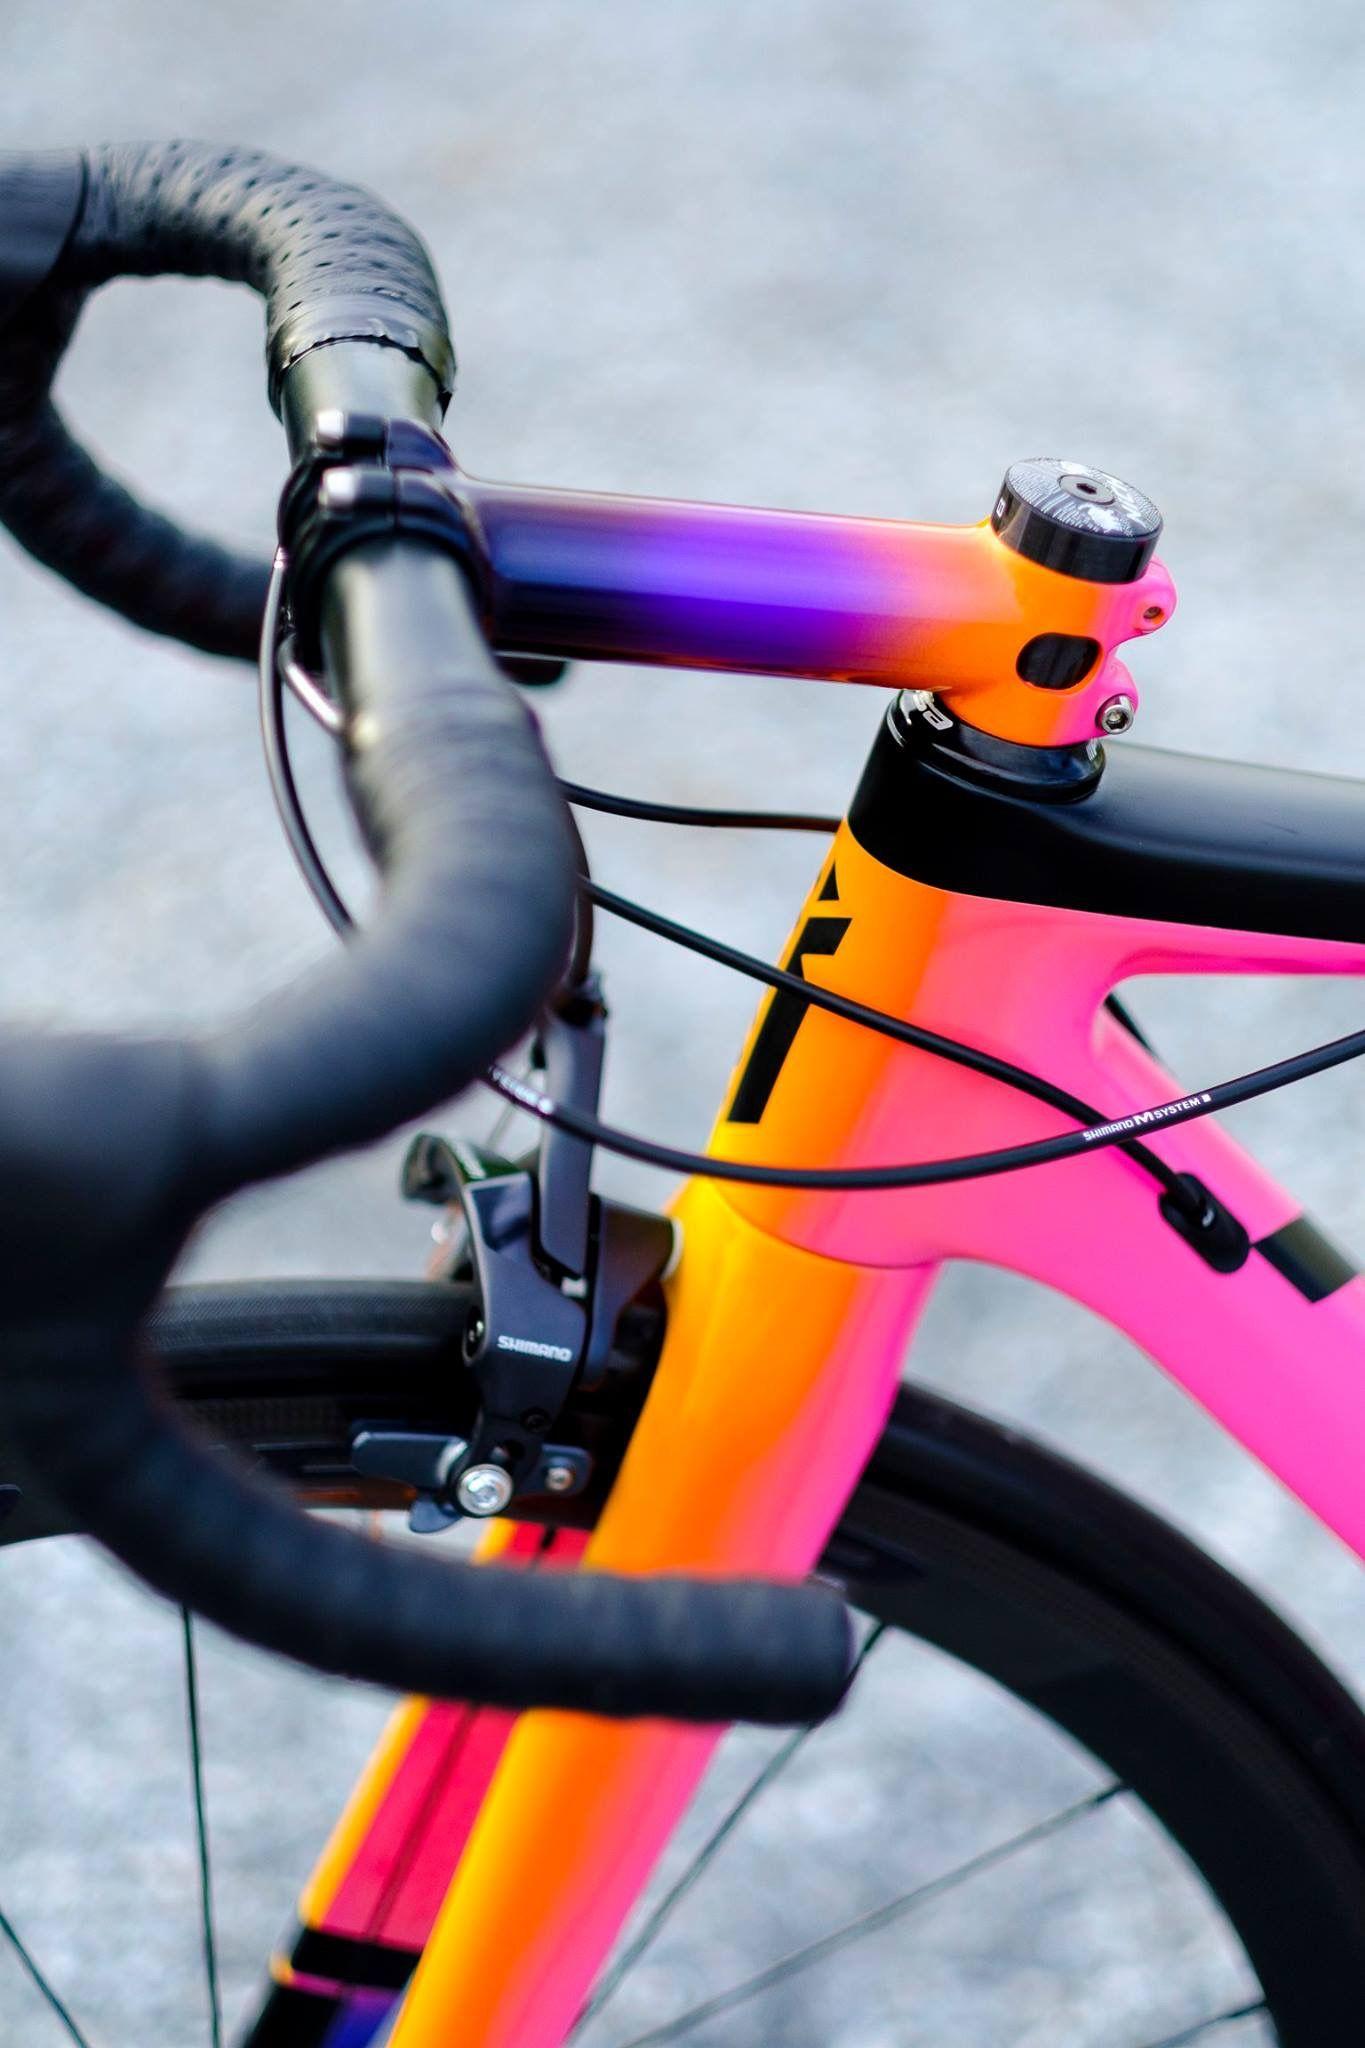 Pin de Esteban Macari en Fixie | Pinterest | Bicicleta, Ciclismo y ...